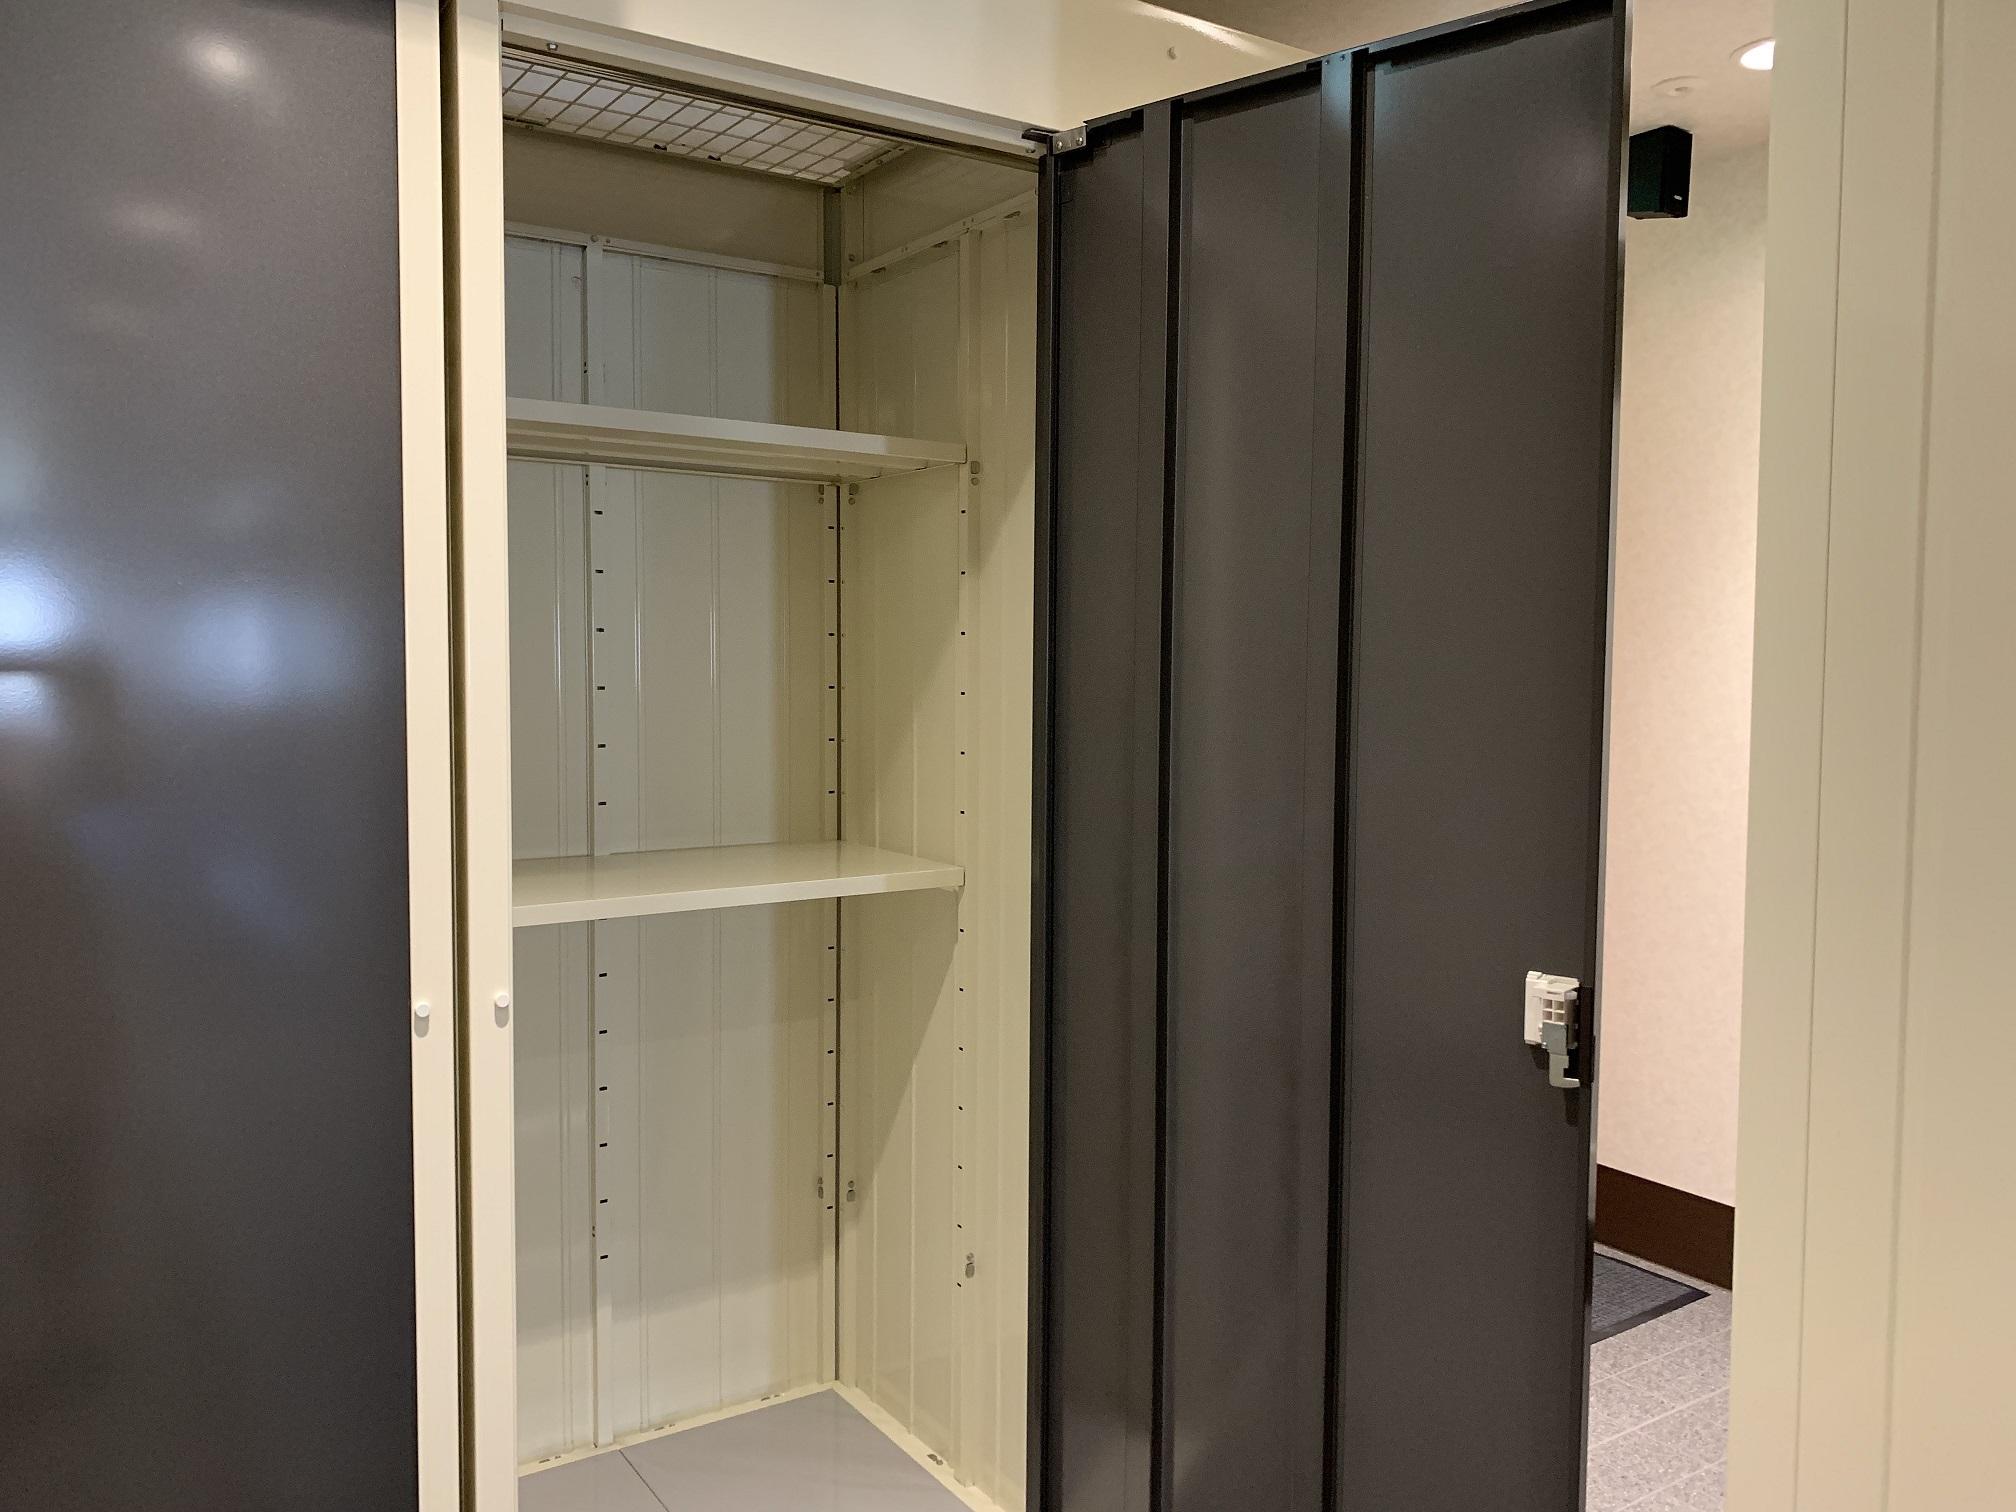 INABA96西保木間店 棚板は簡単に移動できます